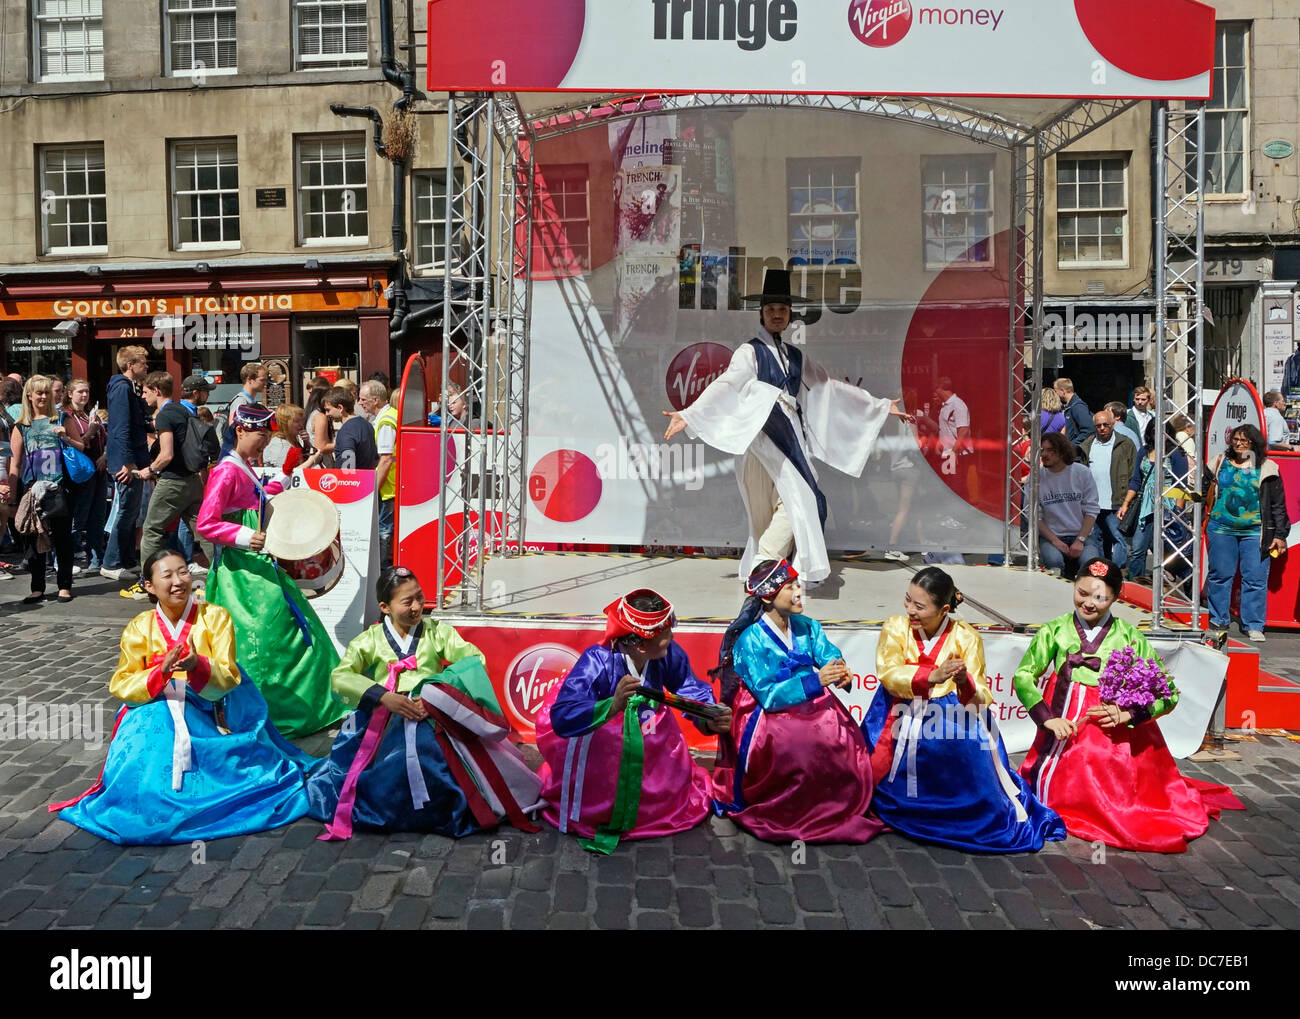 Modi Theatre Korea promoting A Romance show in The Royal Mile Edinburgh during the 2013 Edinburgh Festival Fringe - Stock Image